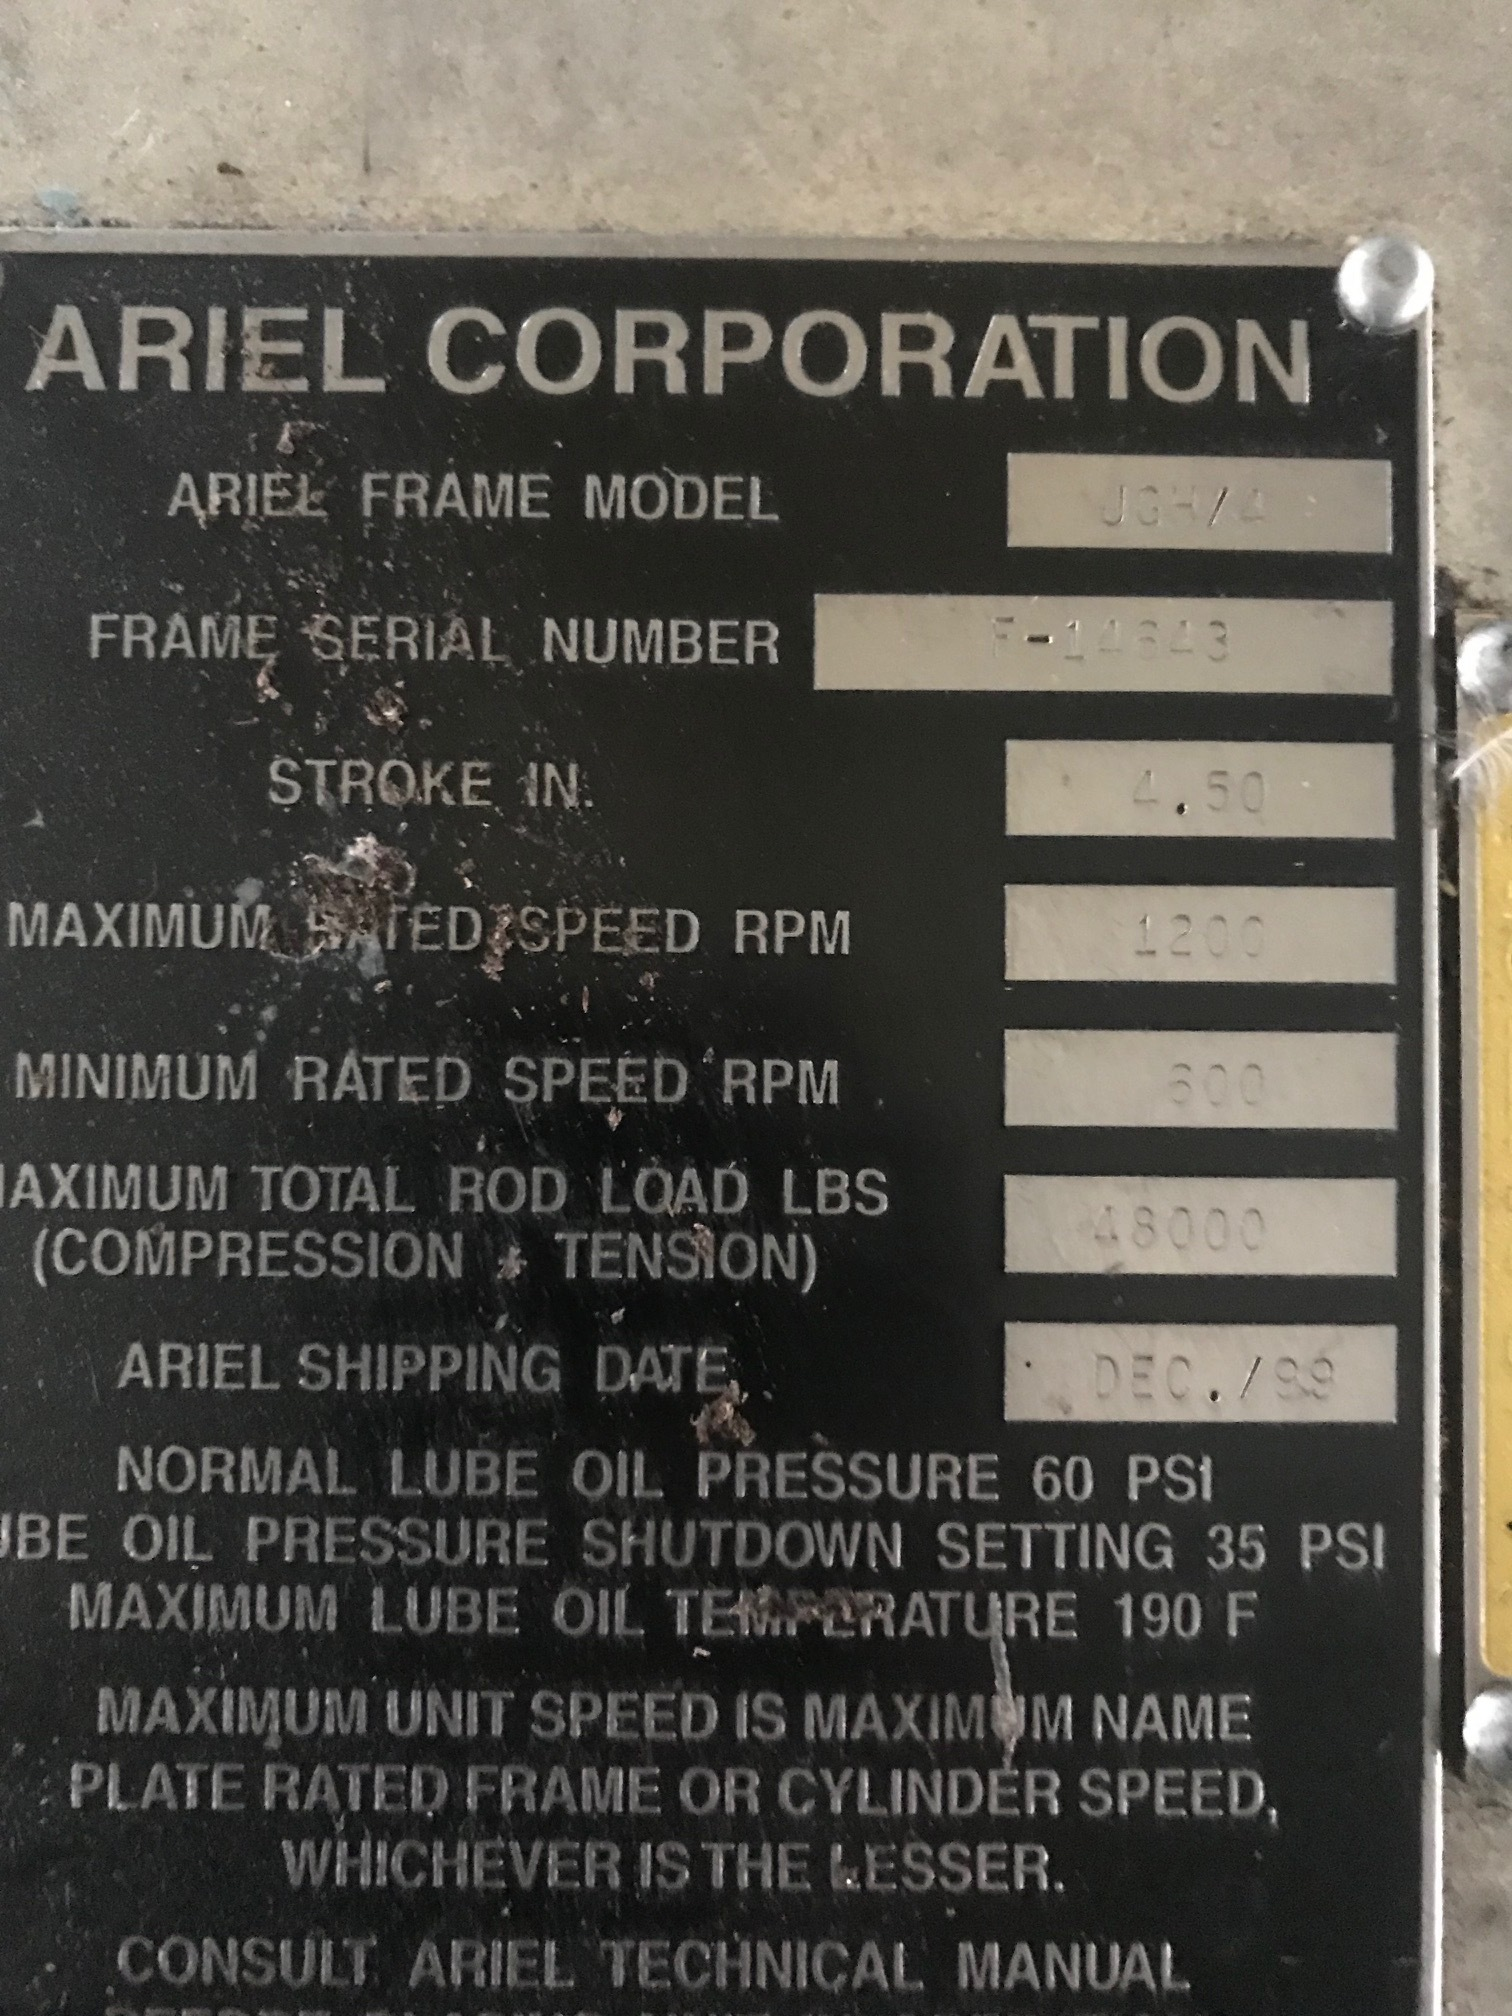 700 hp Waukesha 3521GL Ariel JGH-4 Reciprocating Compressor